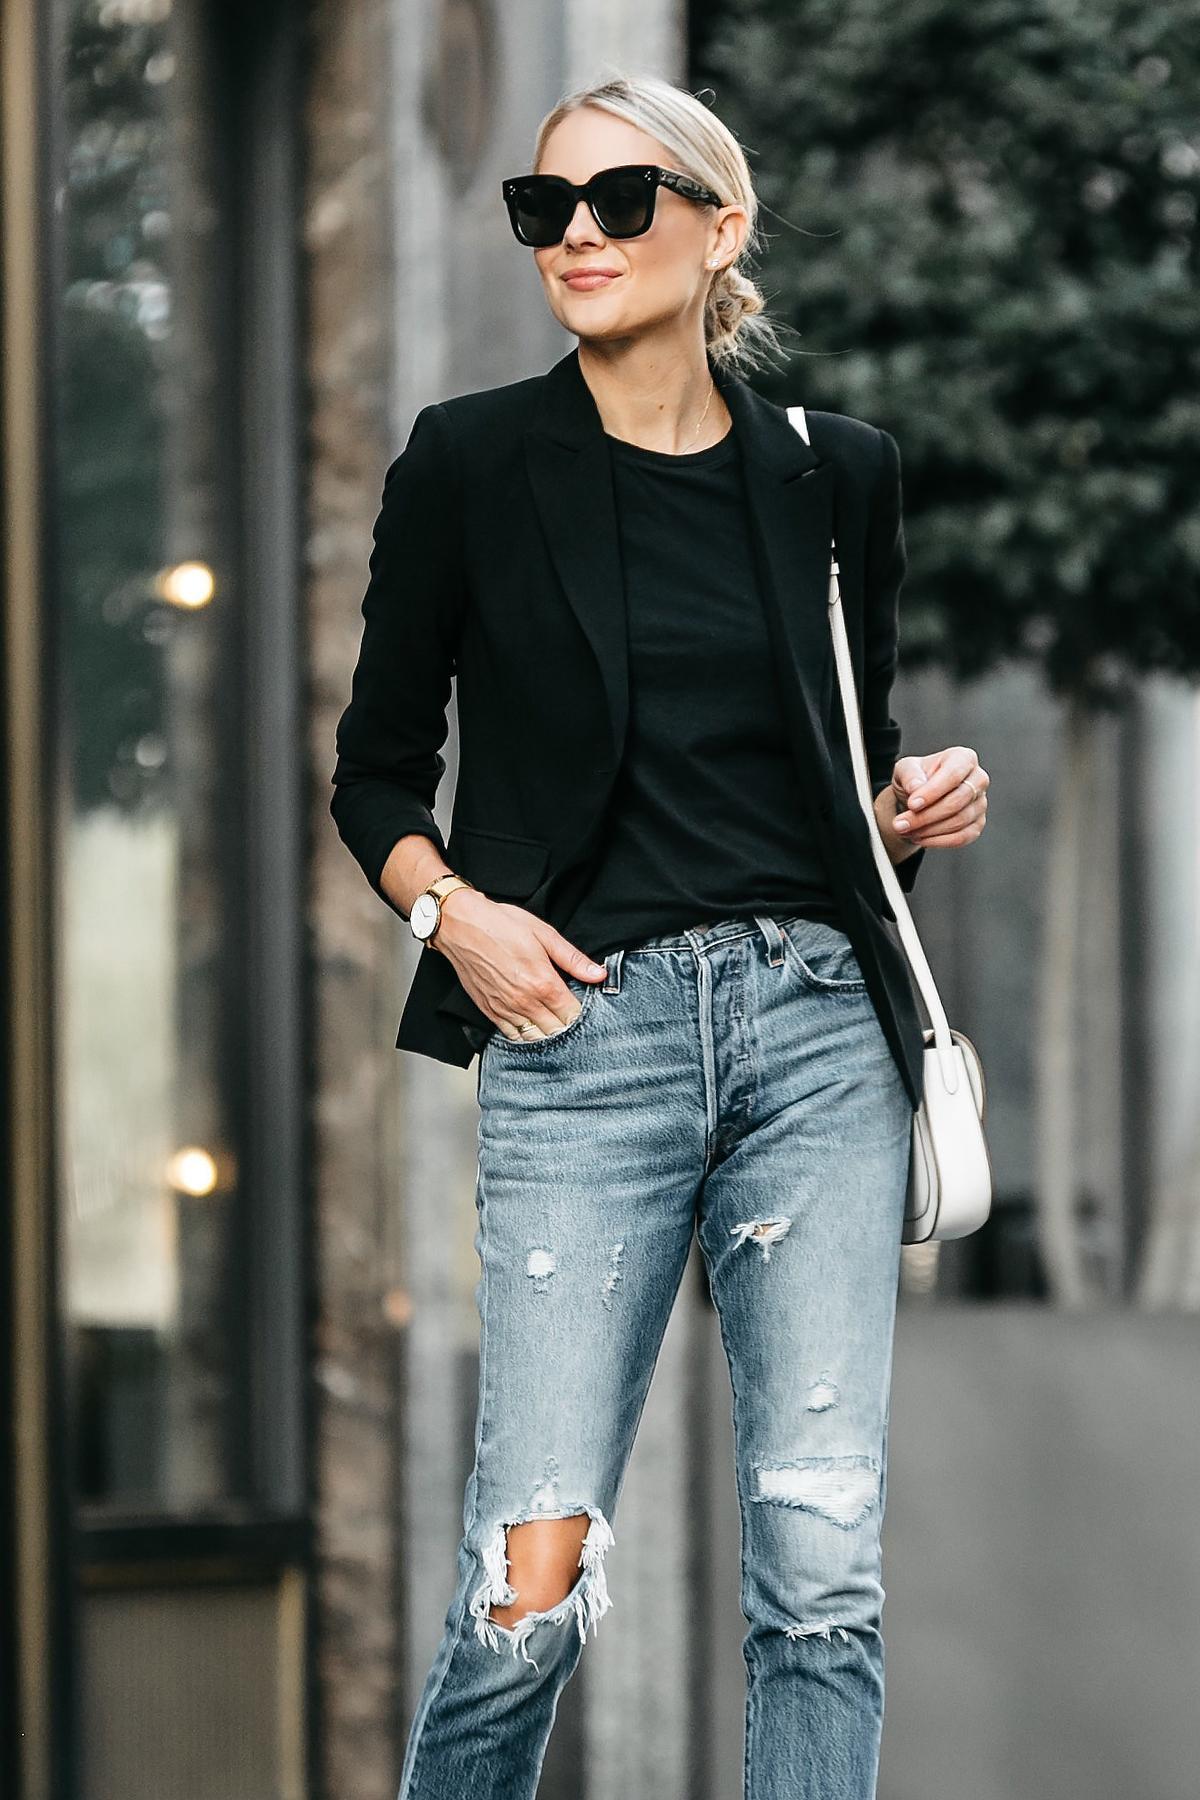 Blonde Woman Wearing Black Blazer Black Tshirt Denim Ripped Jeans Outfit Fashion Jackson Dallas Blogger Fashion Blogger Street Style